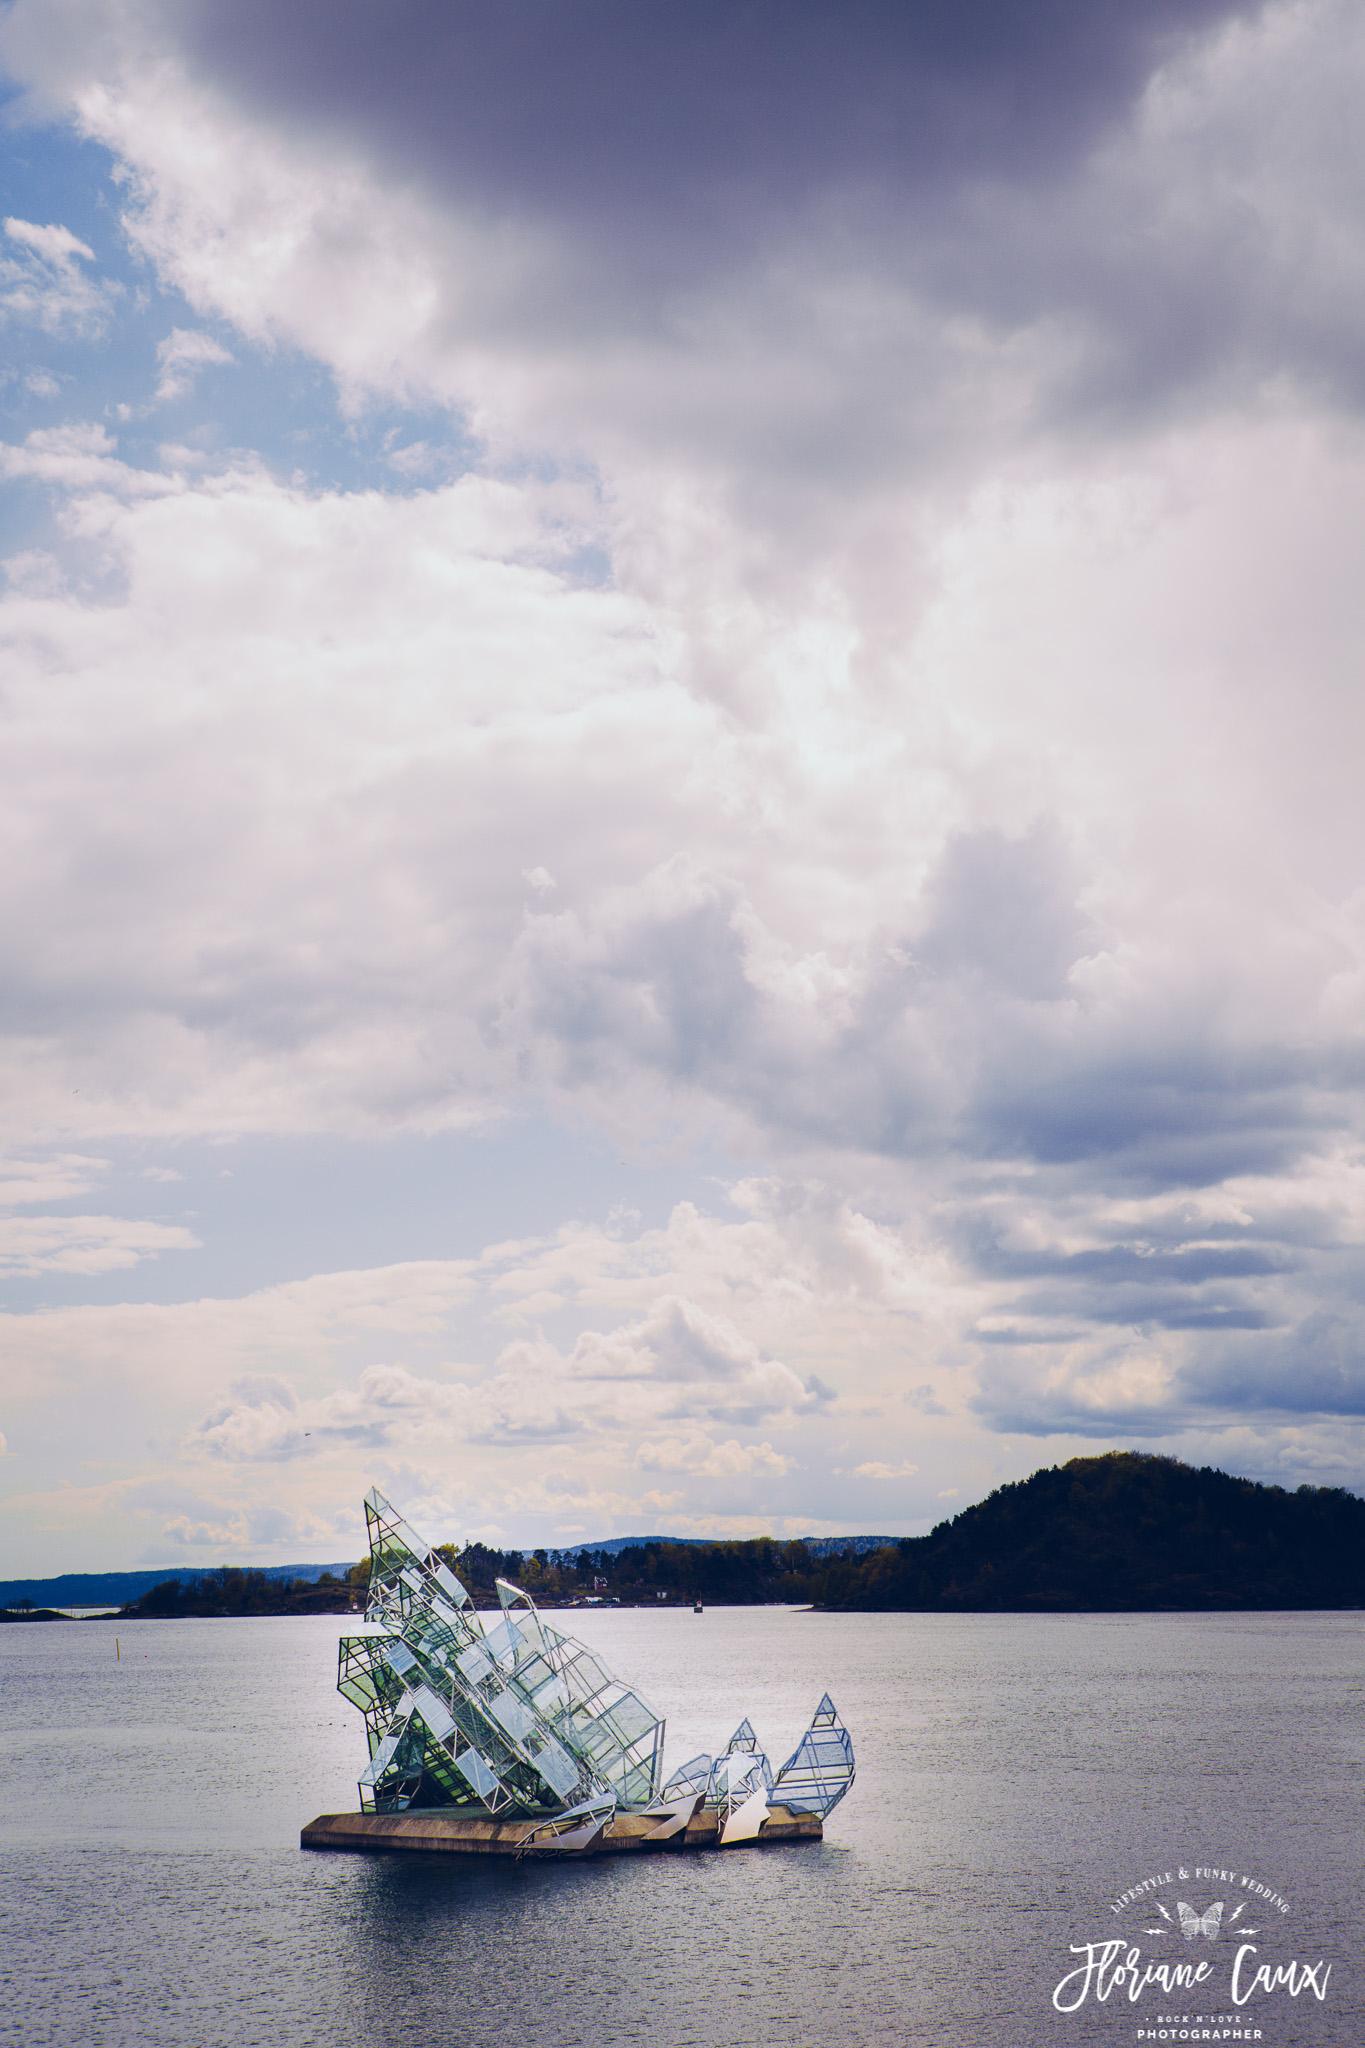 destination-wedding-photographer-oslo-norway-floriane-caux-64